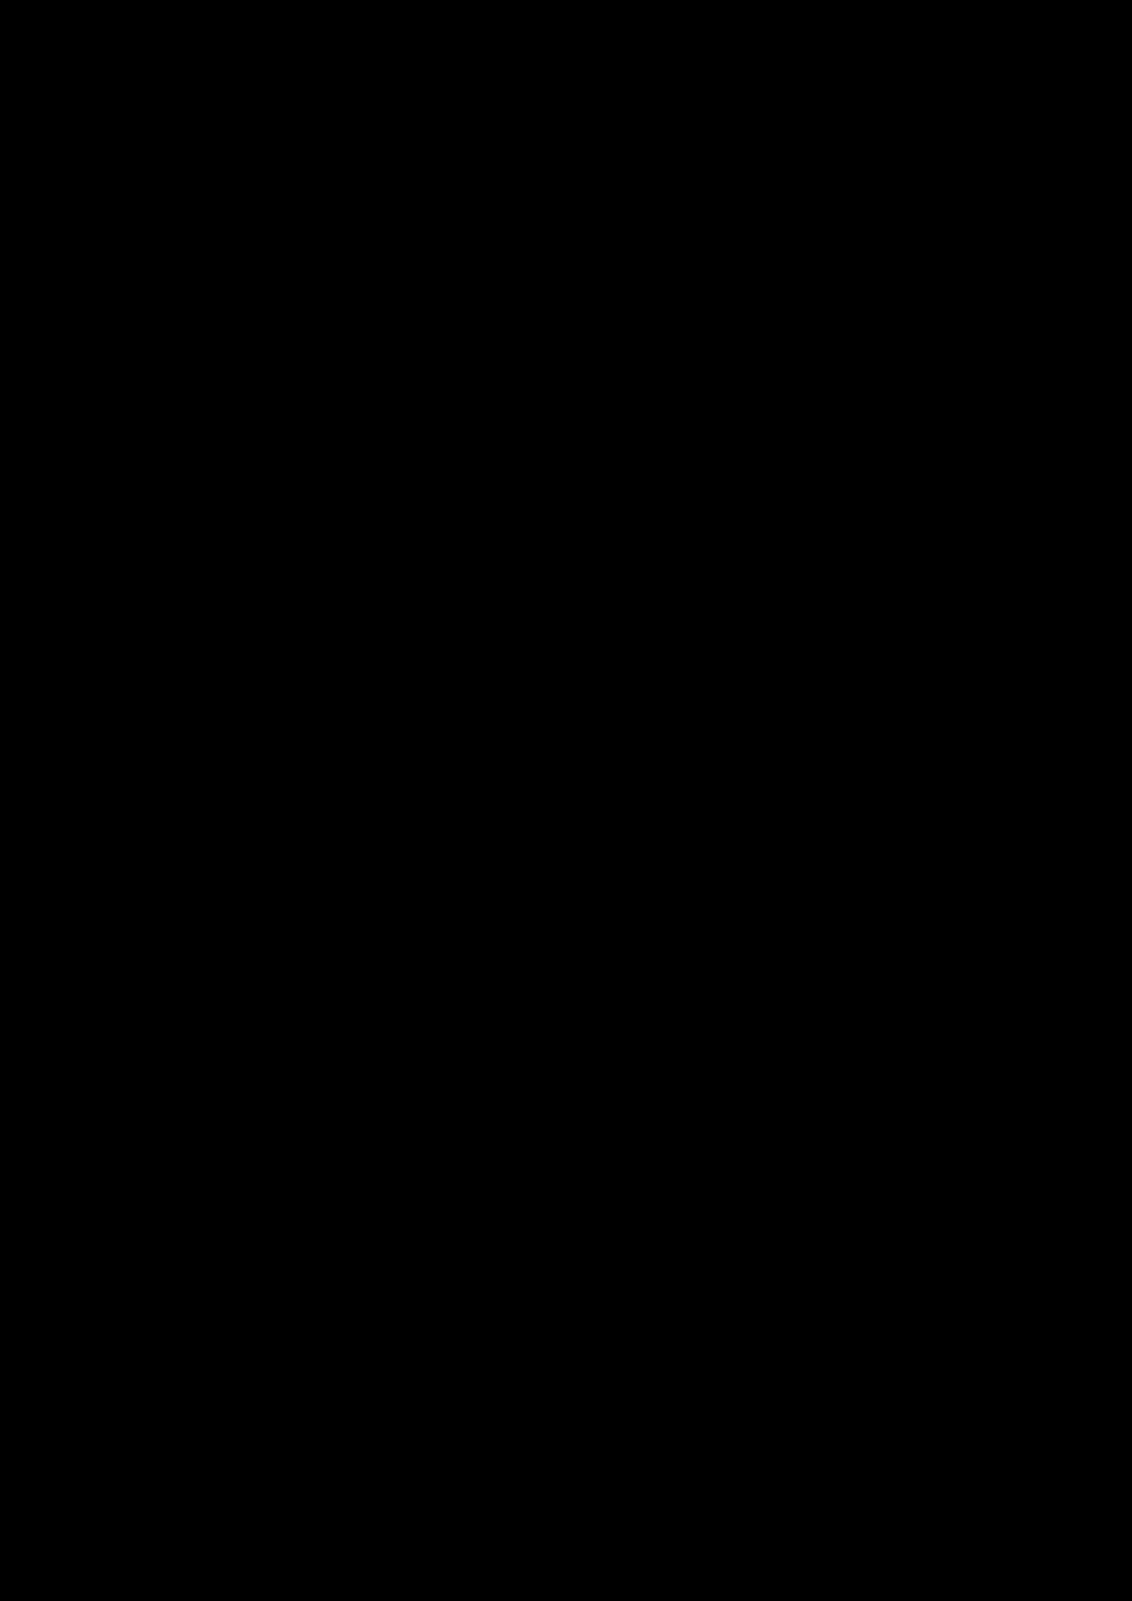 Ten lyubvi slide, Image 20